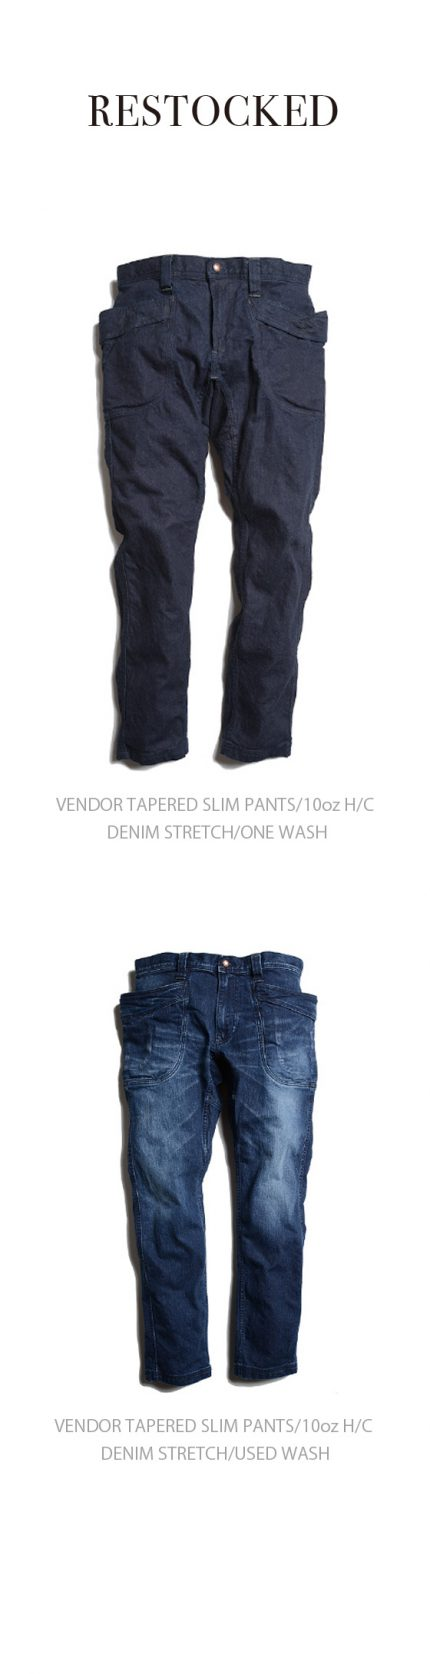 VENDOR TAPERED SLIM PANTS/ONE WASH & USED WASH/ RESTOCKED